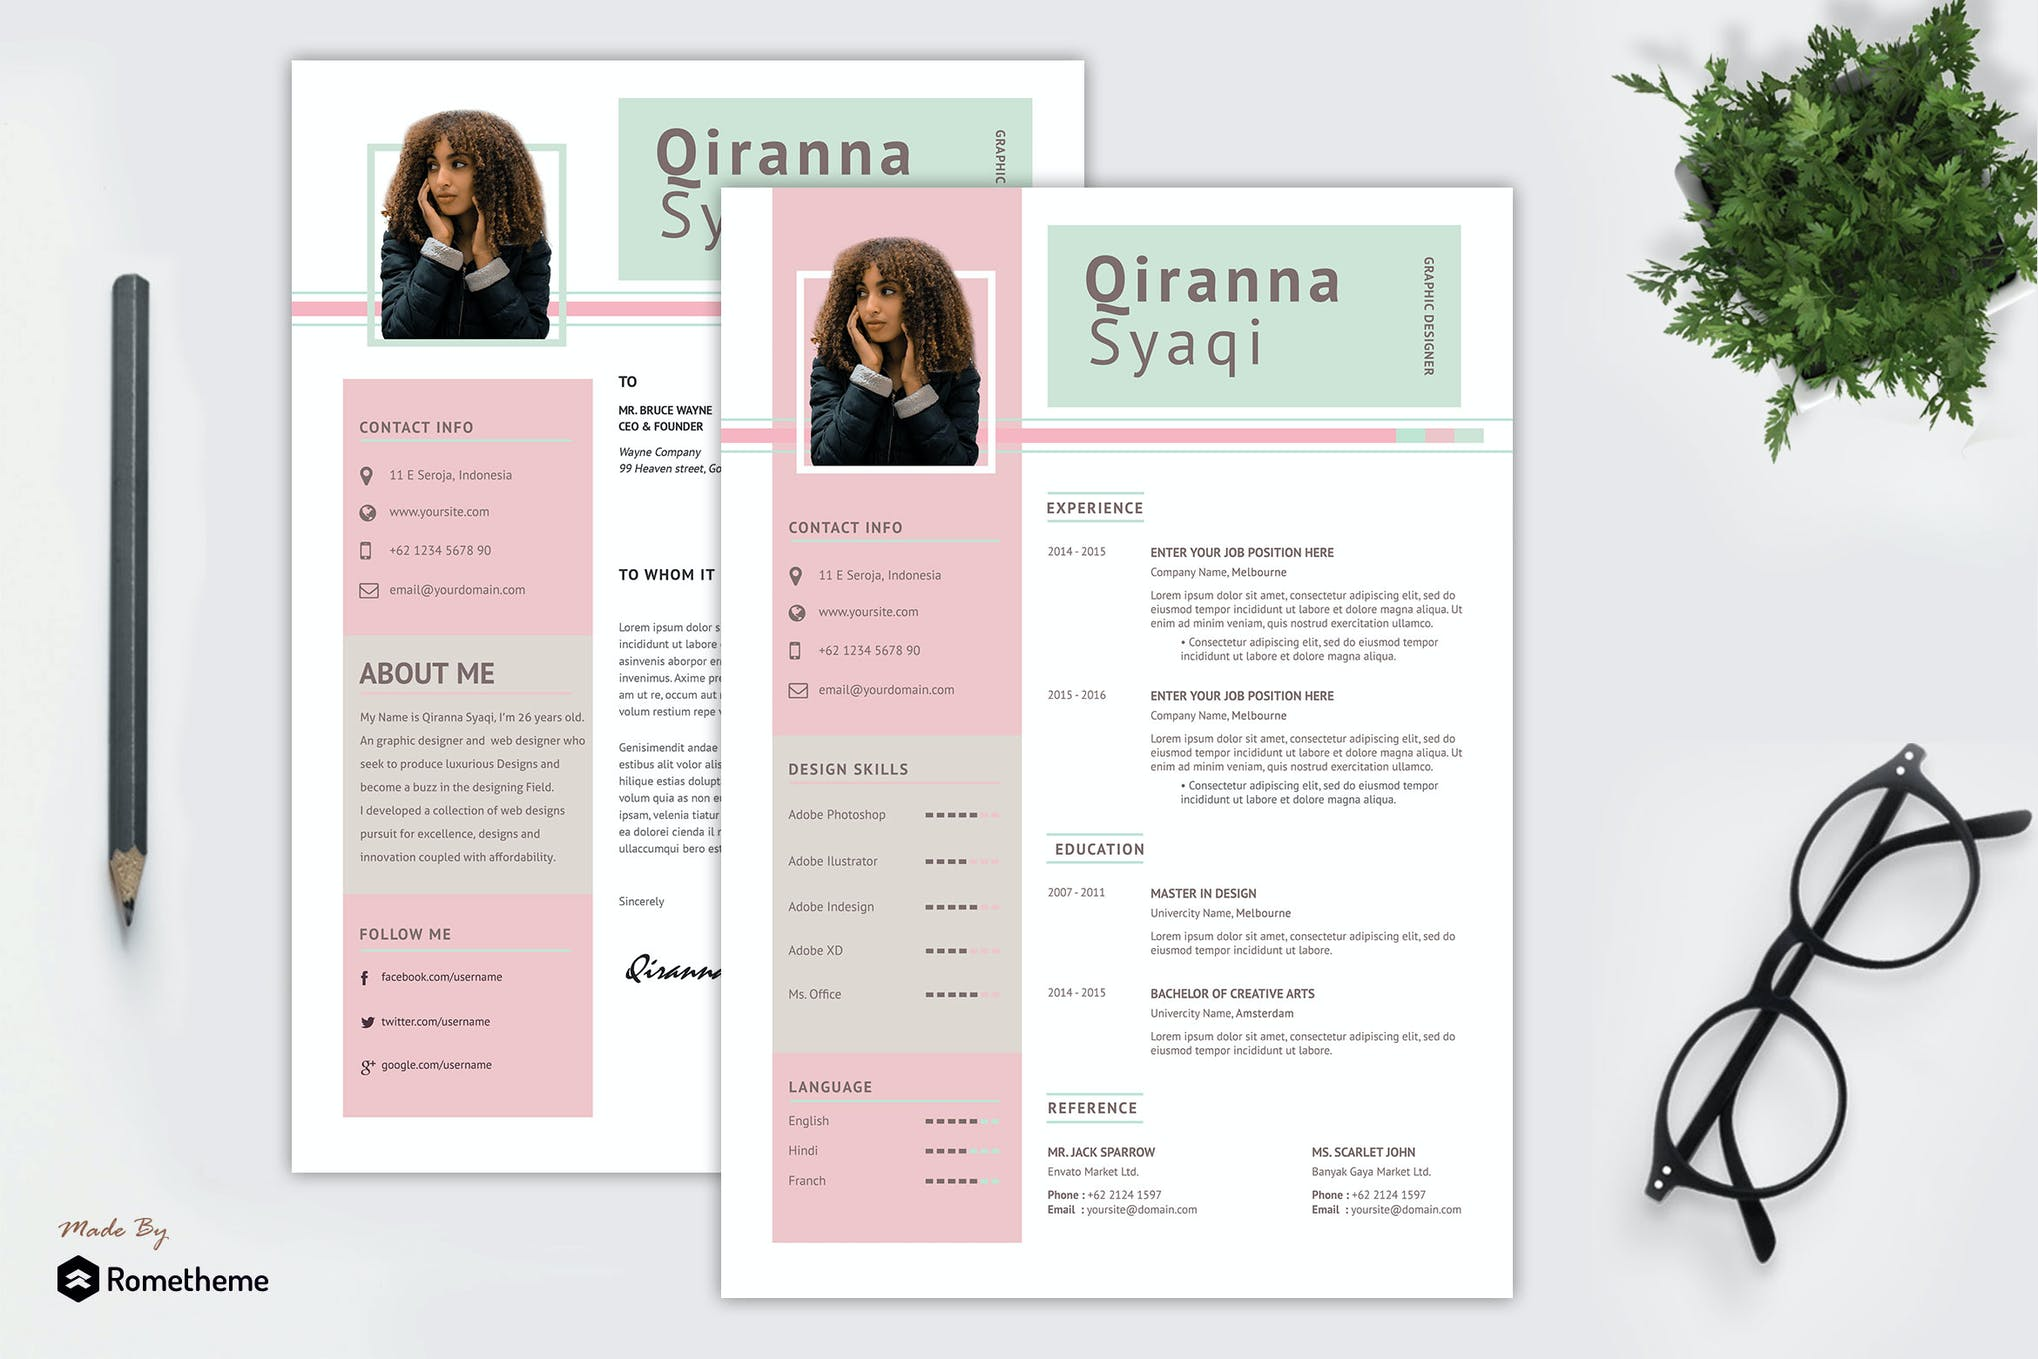 Qiranna Shaqi - Creative Resume Template